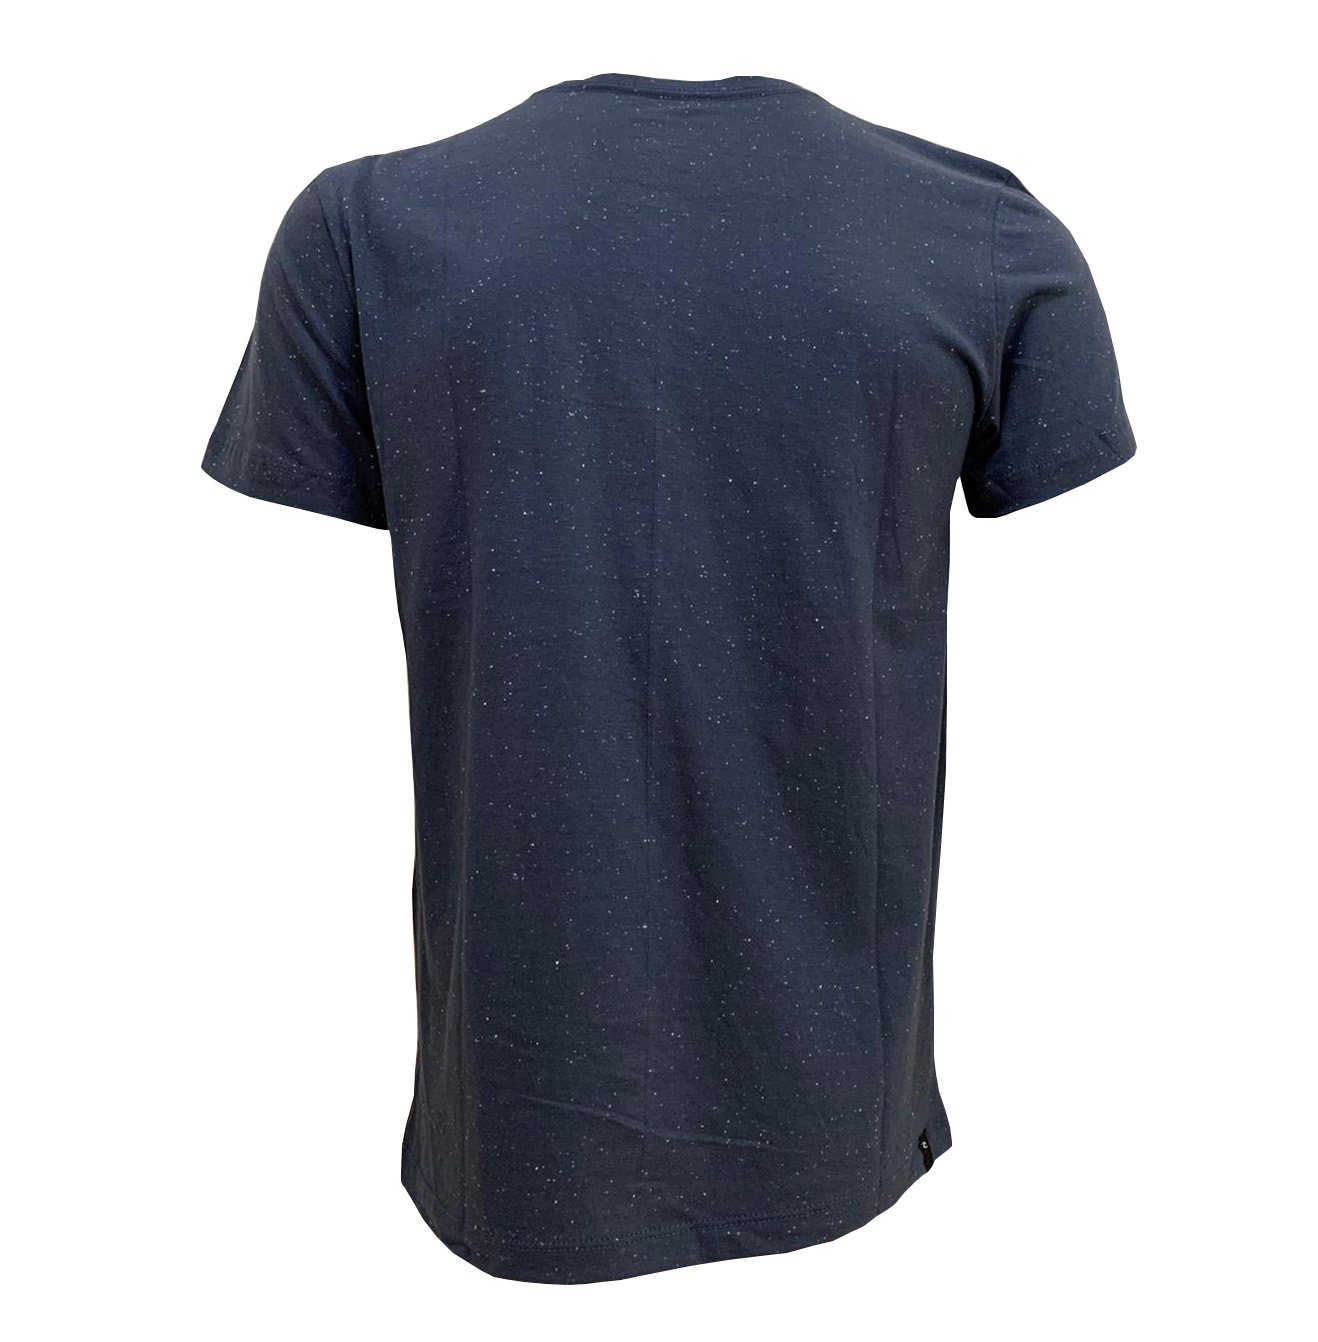 Camiseta Rip Curl Especial Goodday Badda